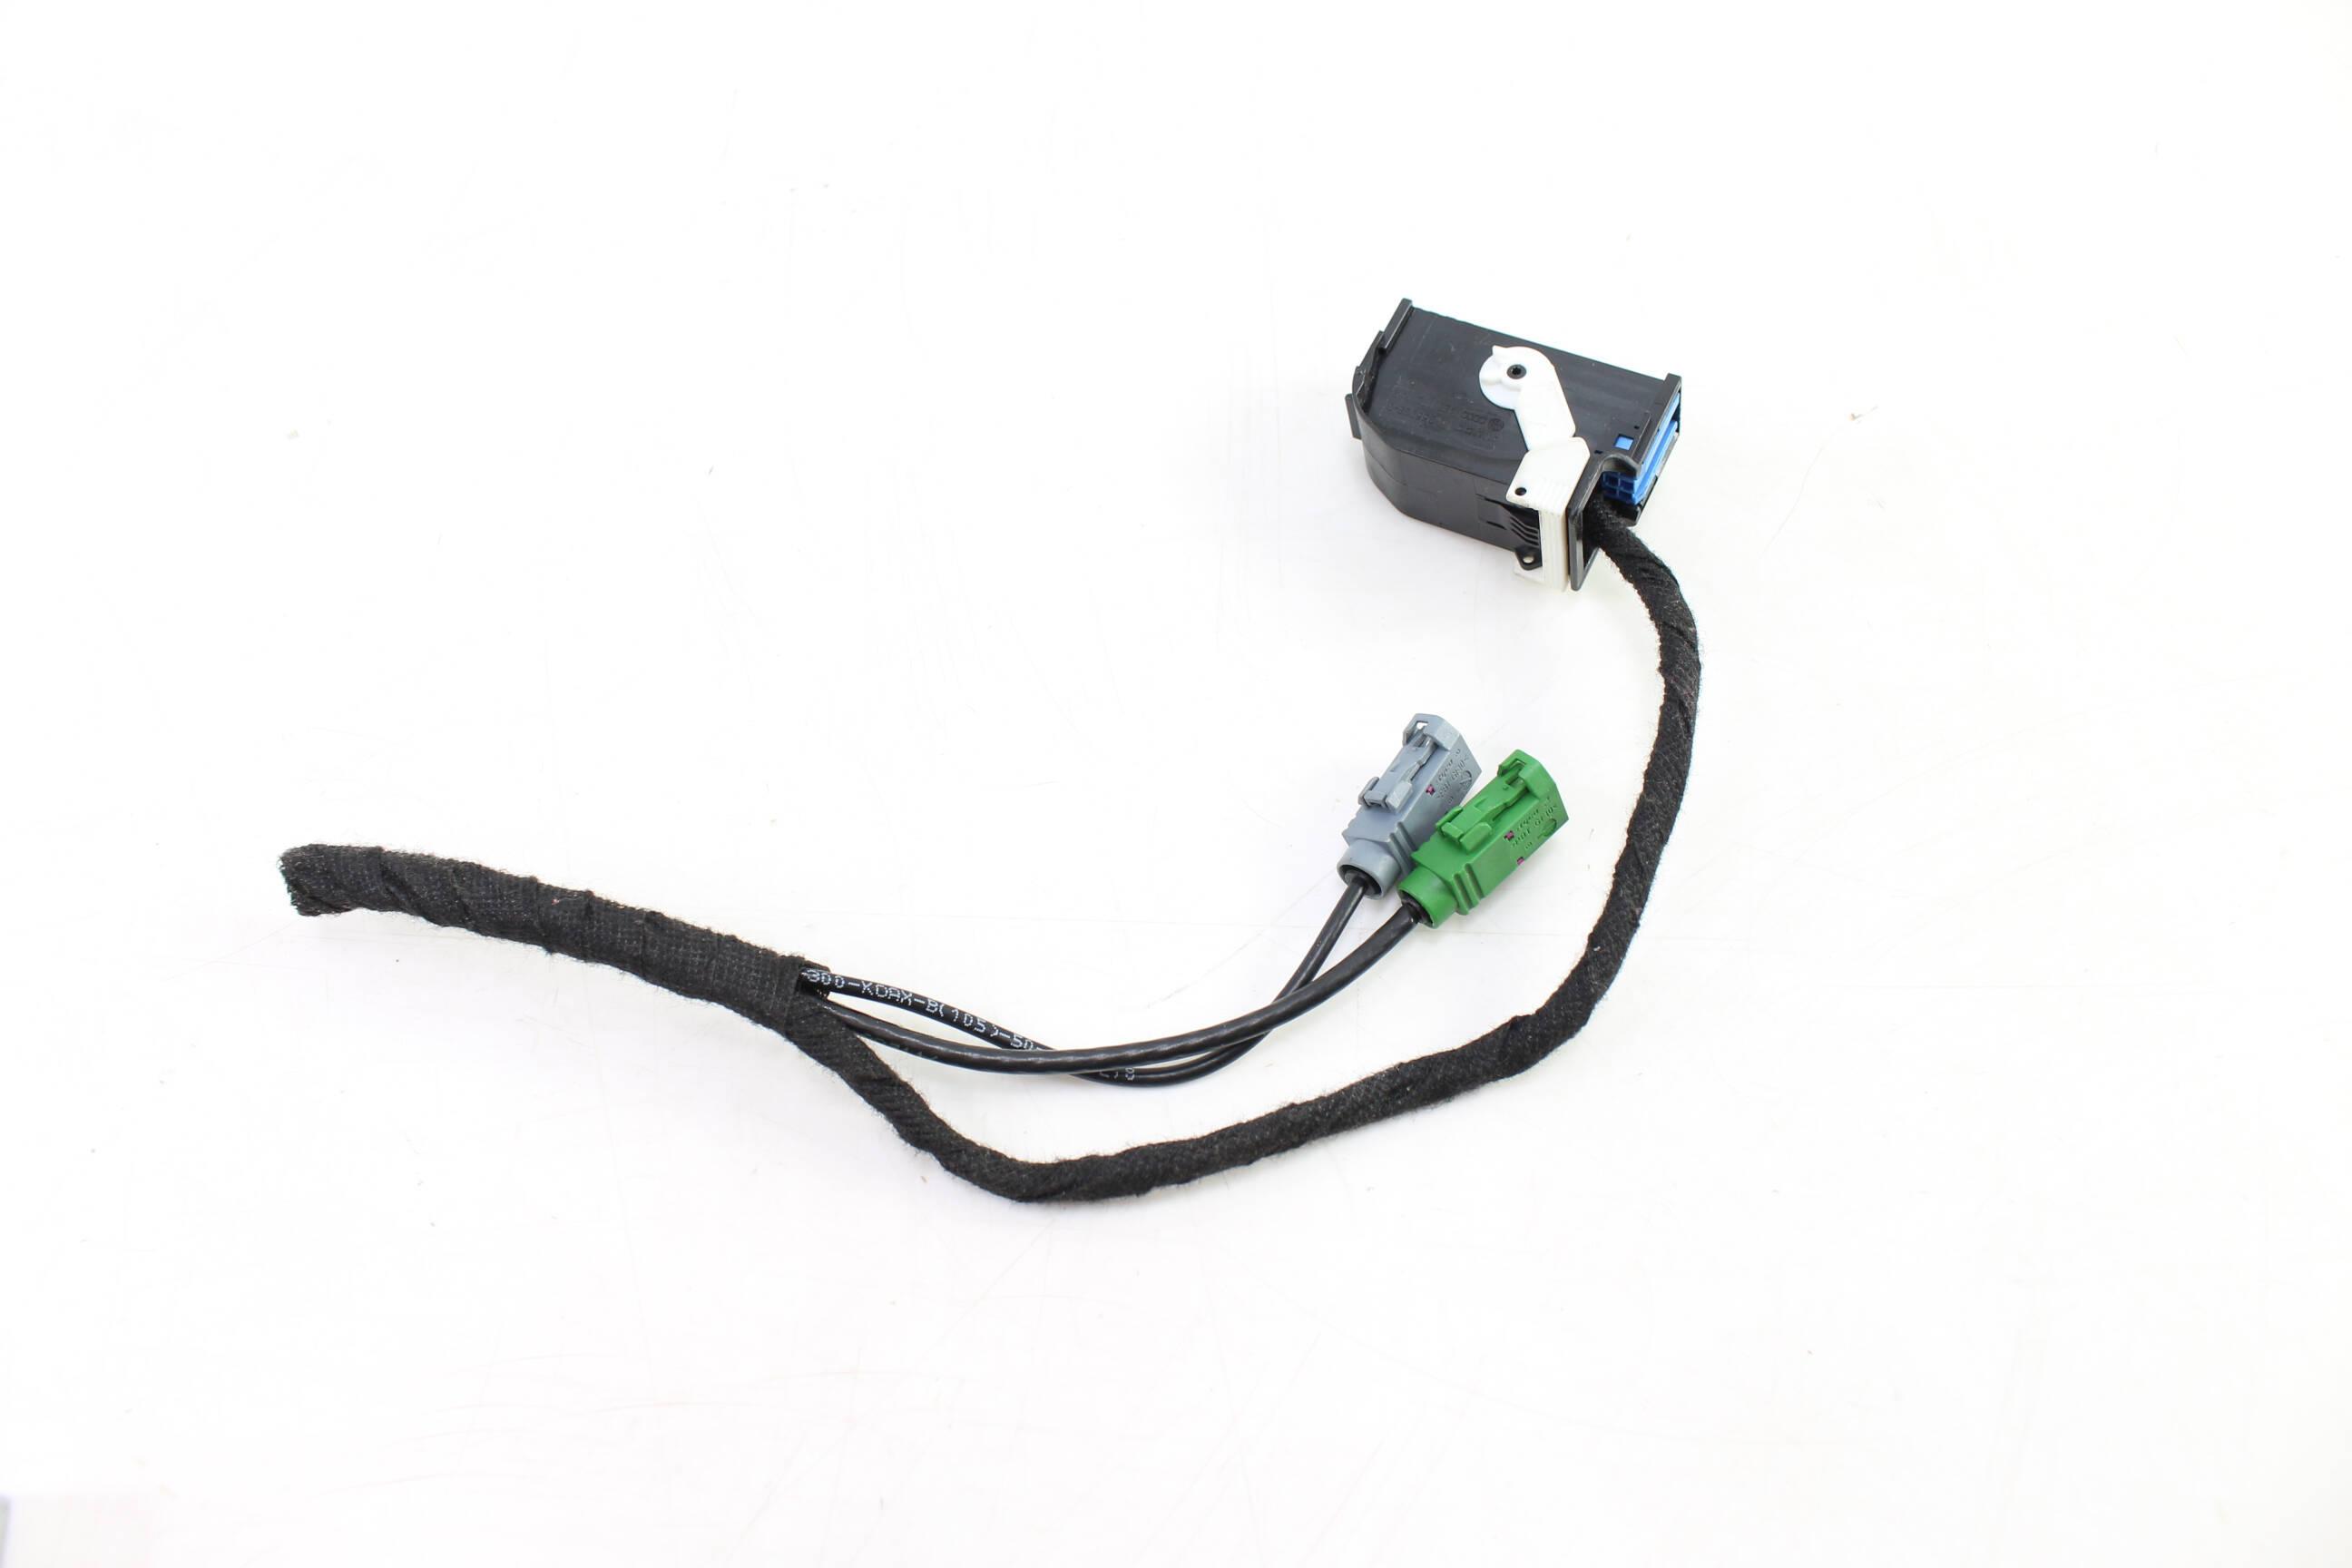 audi s6 c6 rear view reverse camera module wiring harness